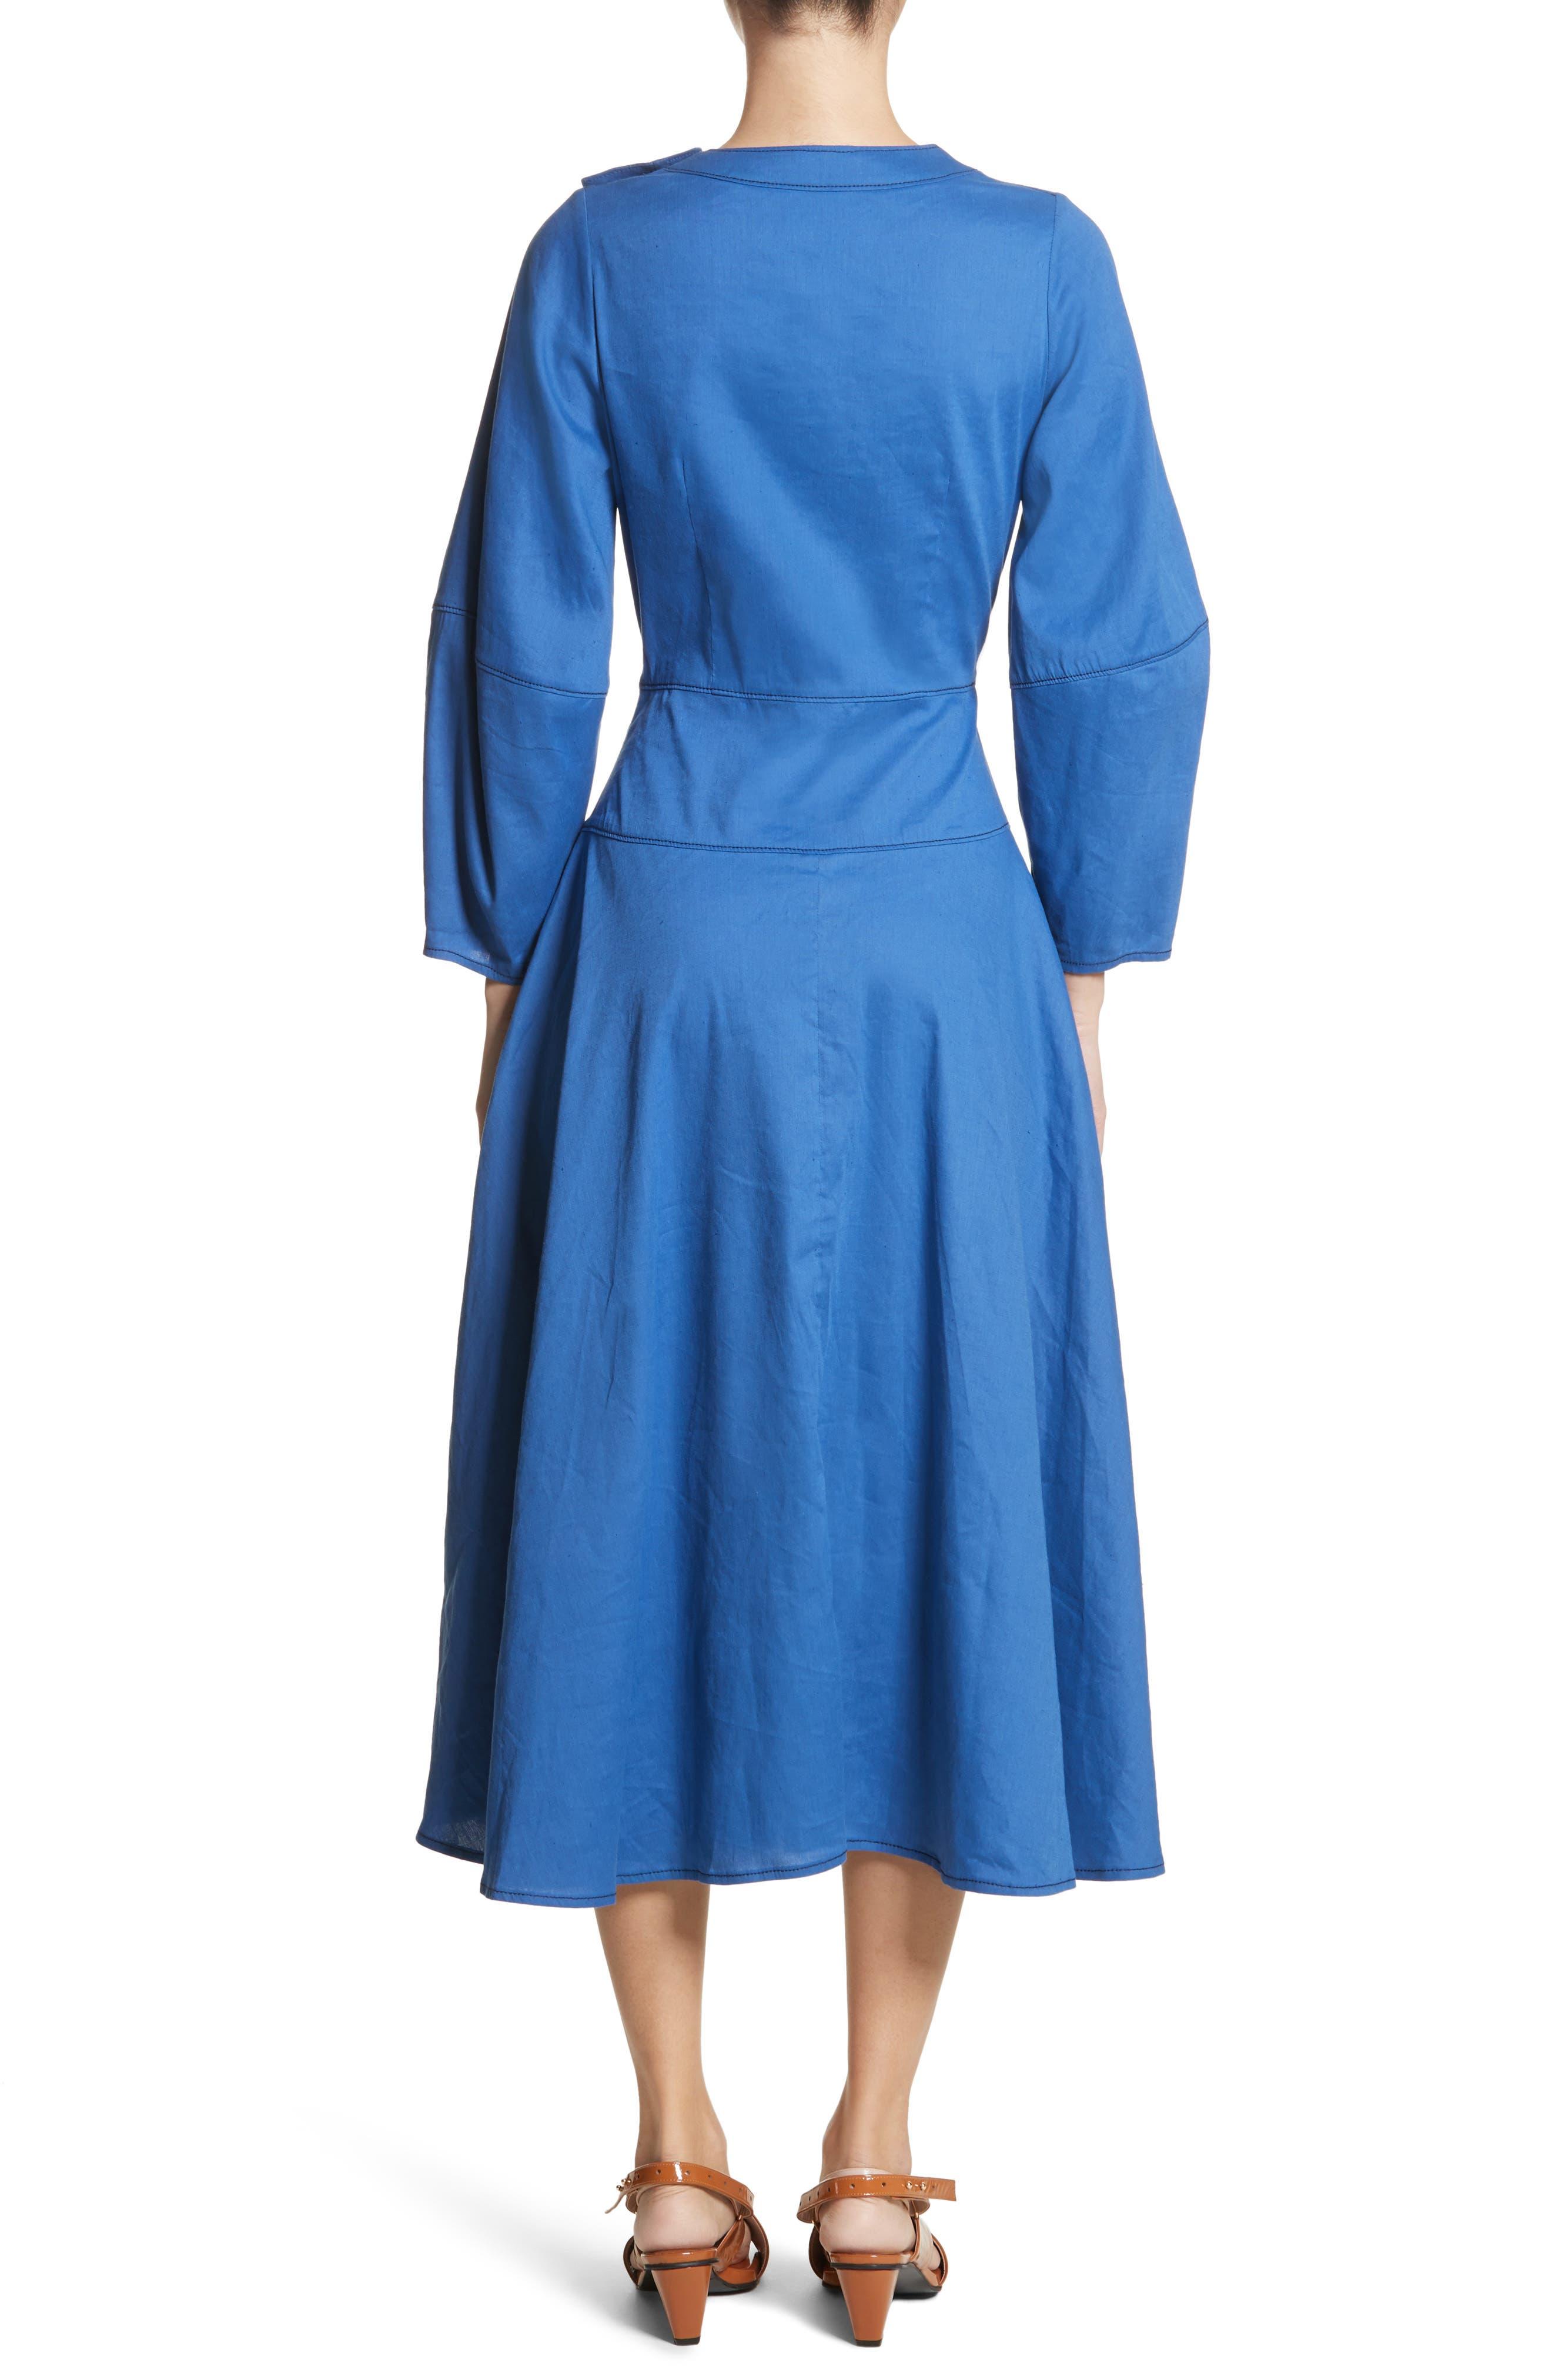 Michaela Linen Dress,                             Alternate thumbnail 2, color,                             Linen Blue